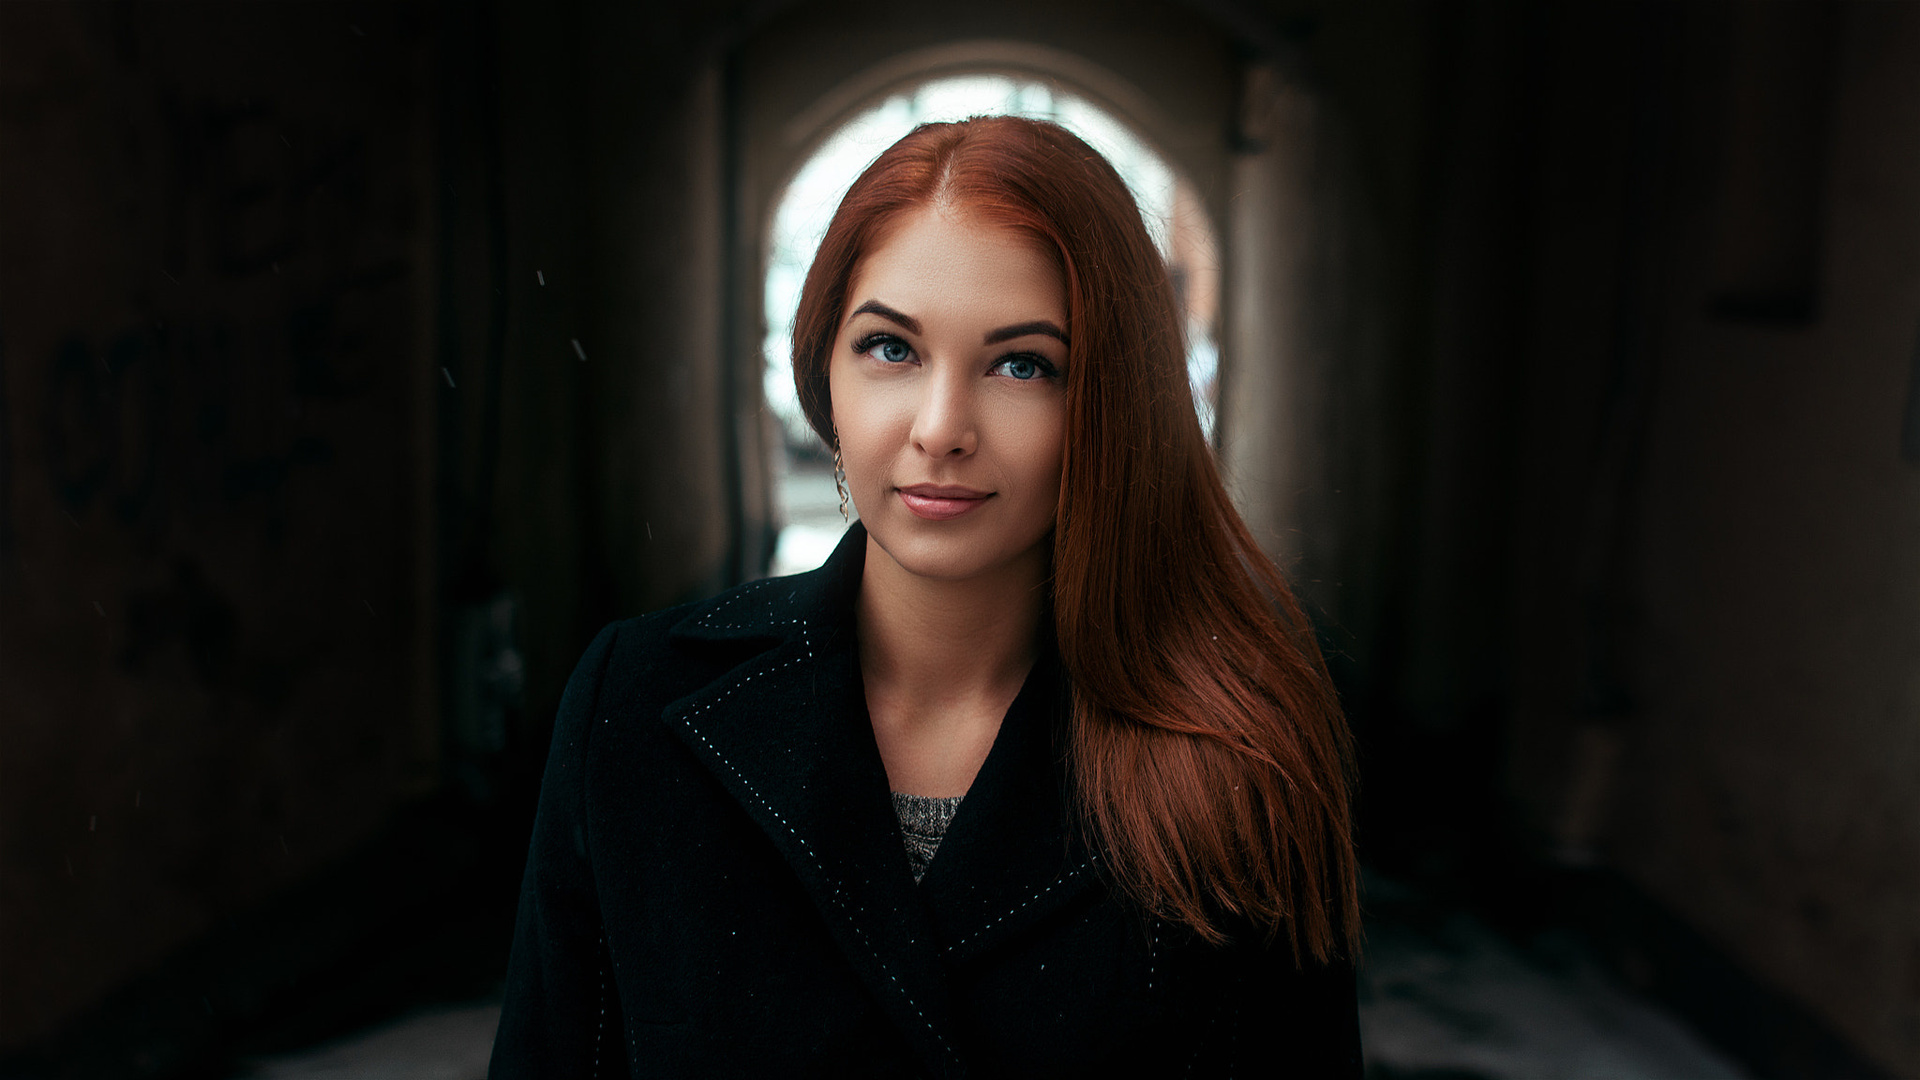 http://se.uploads.ru/13Bcy.jpg